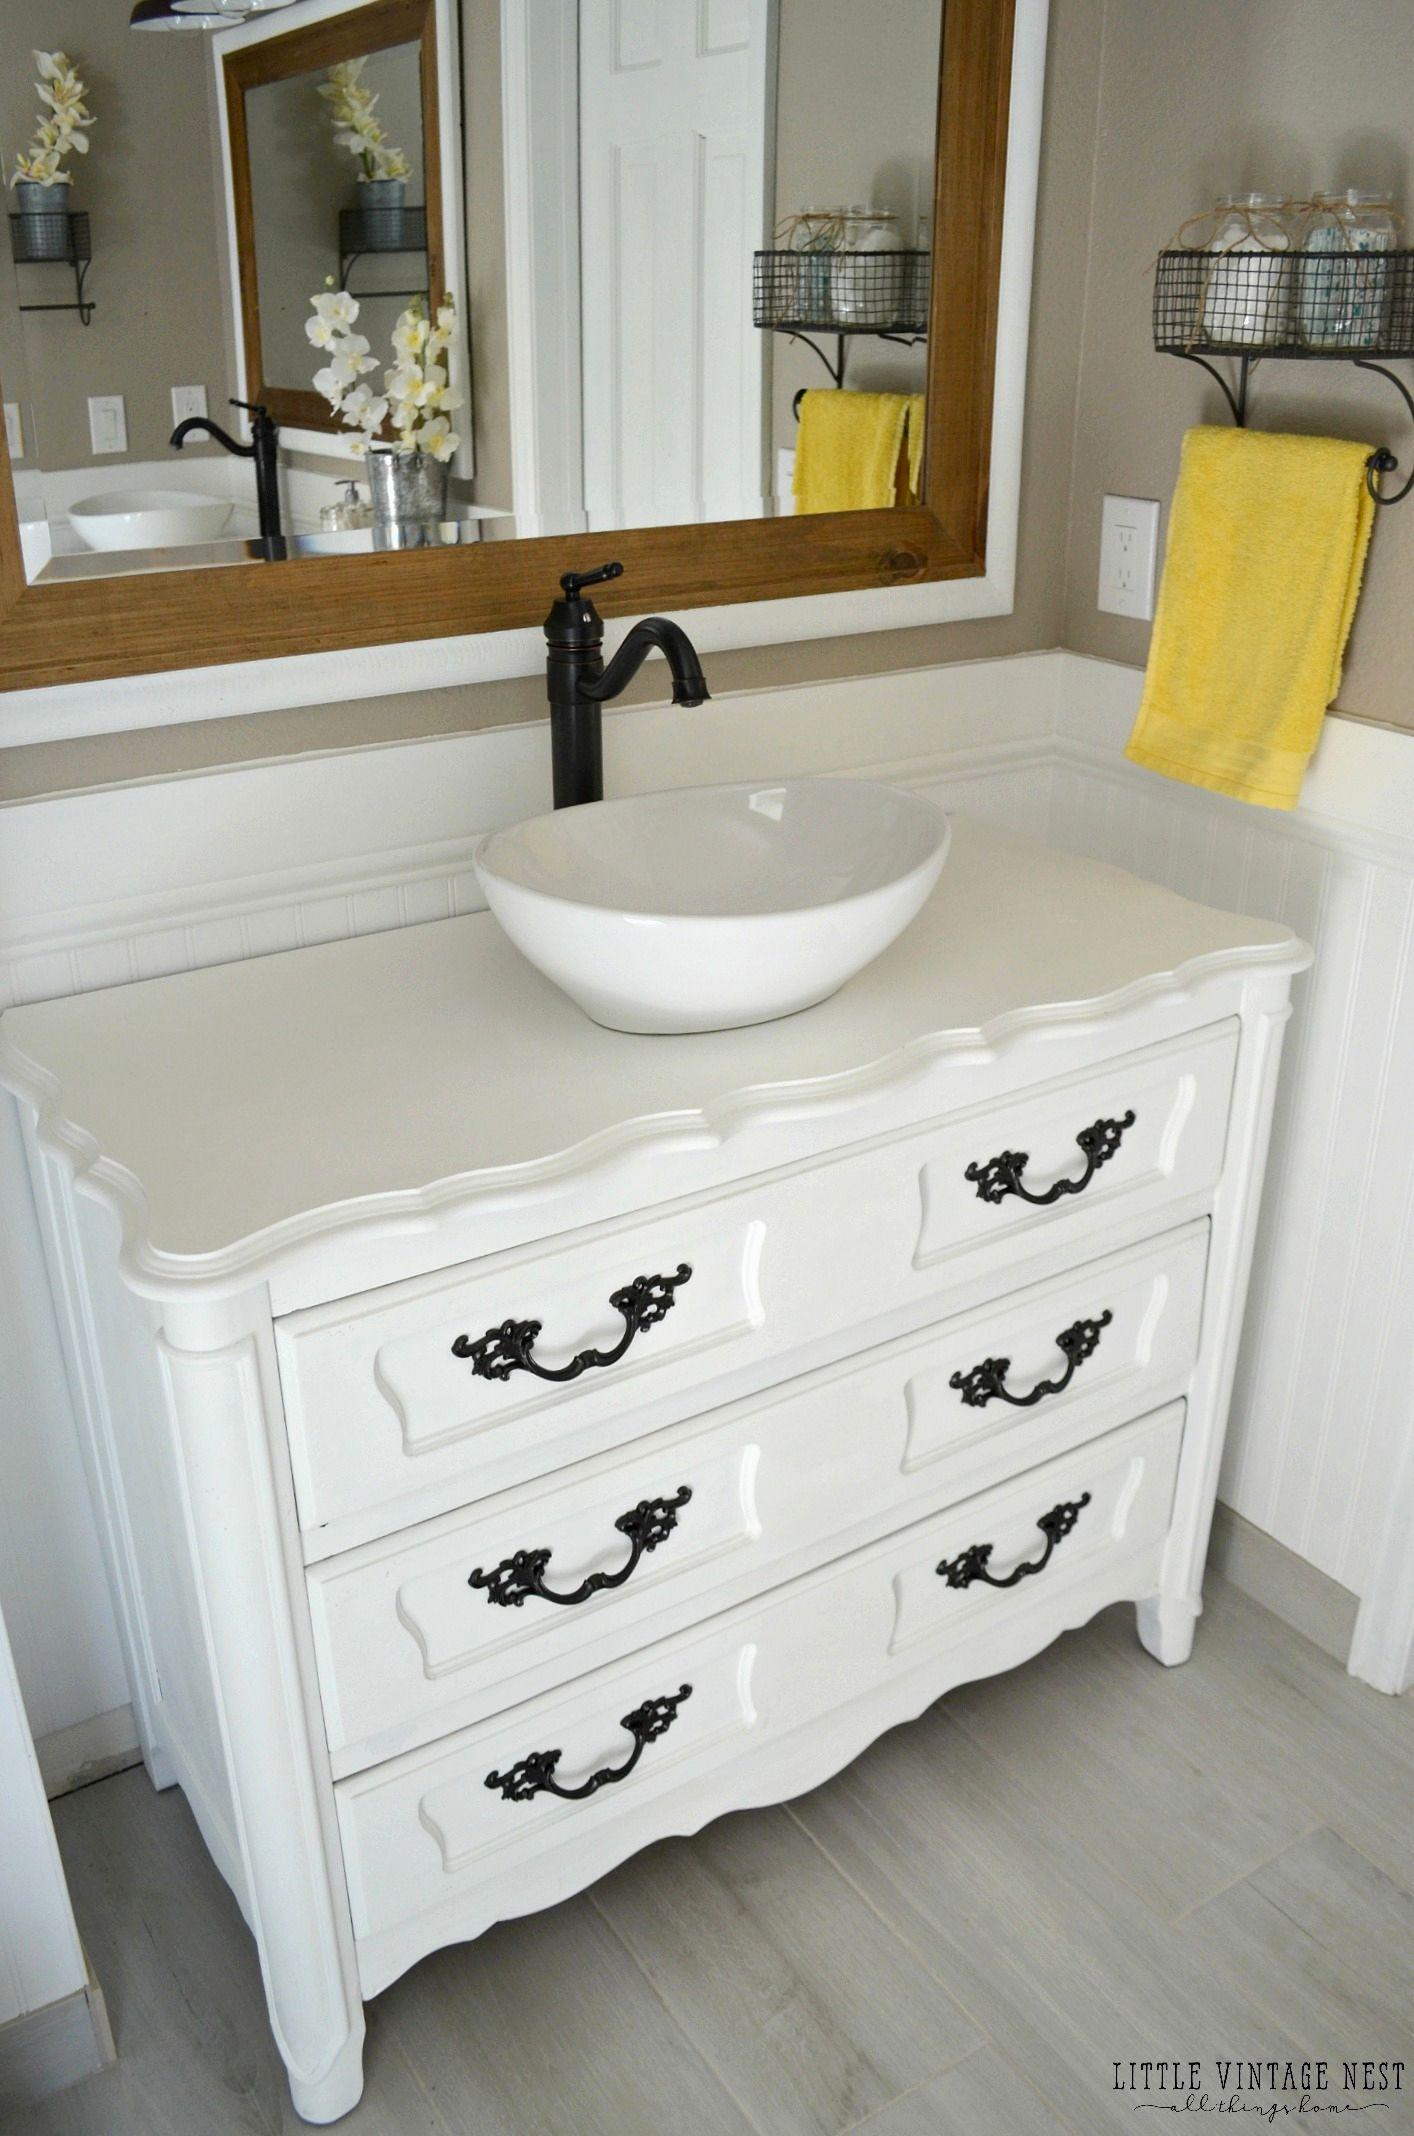 terrific bathroom vanity images photograph-Fantastic Bathroom Vanity Images Décor